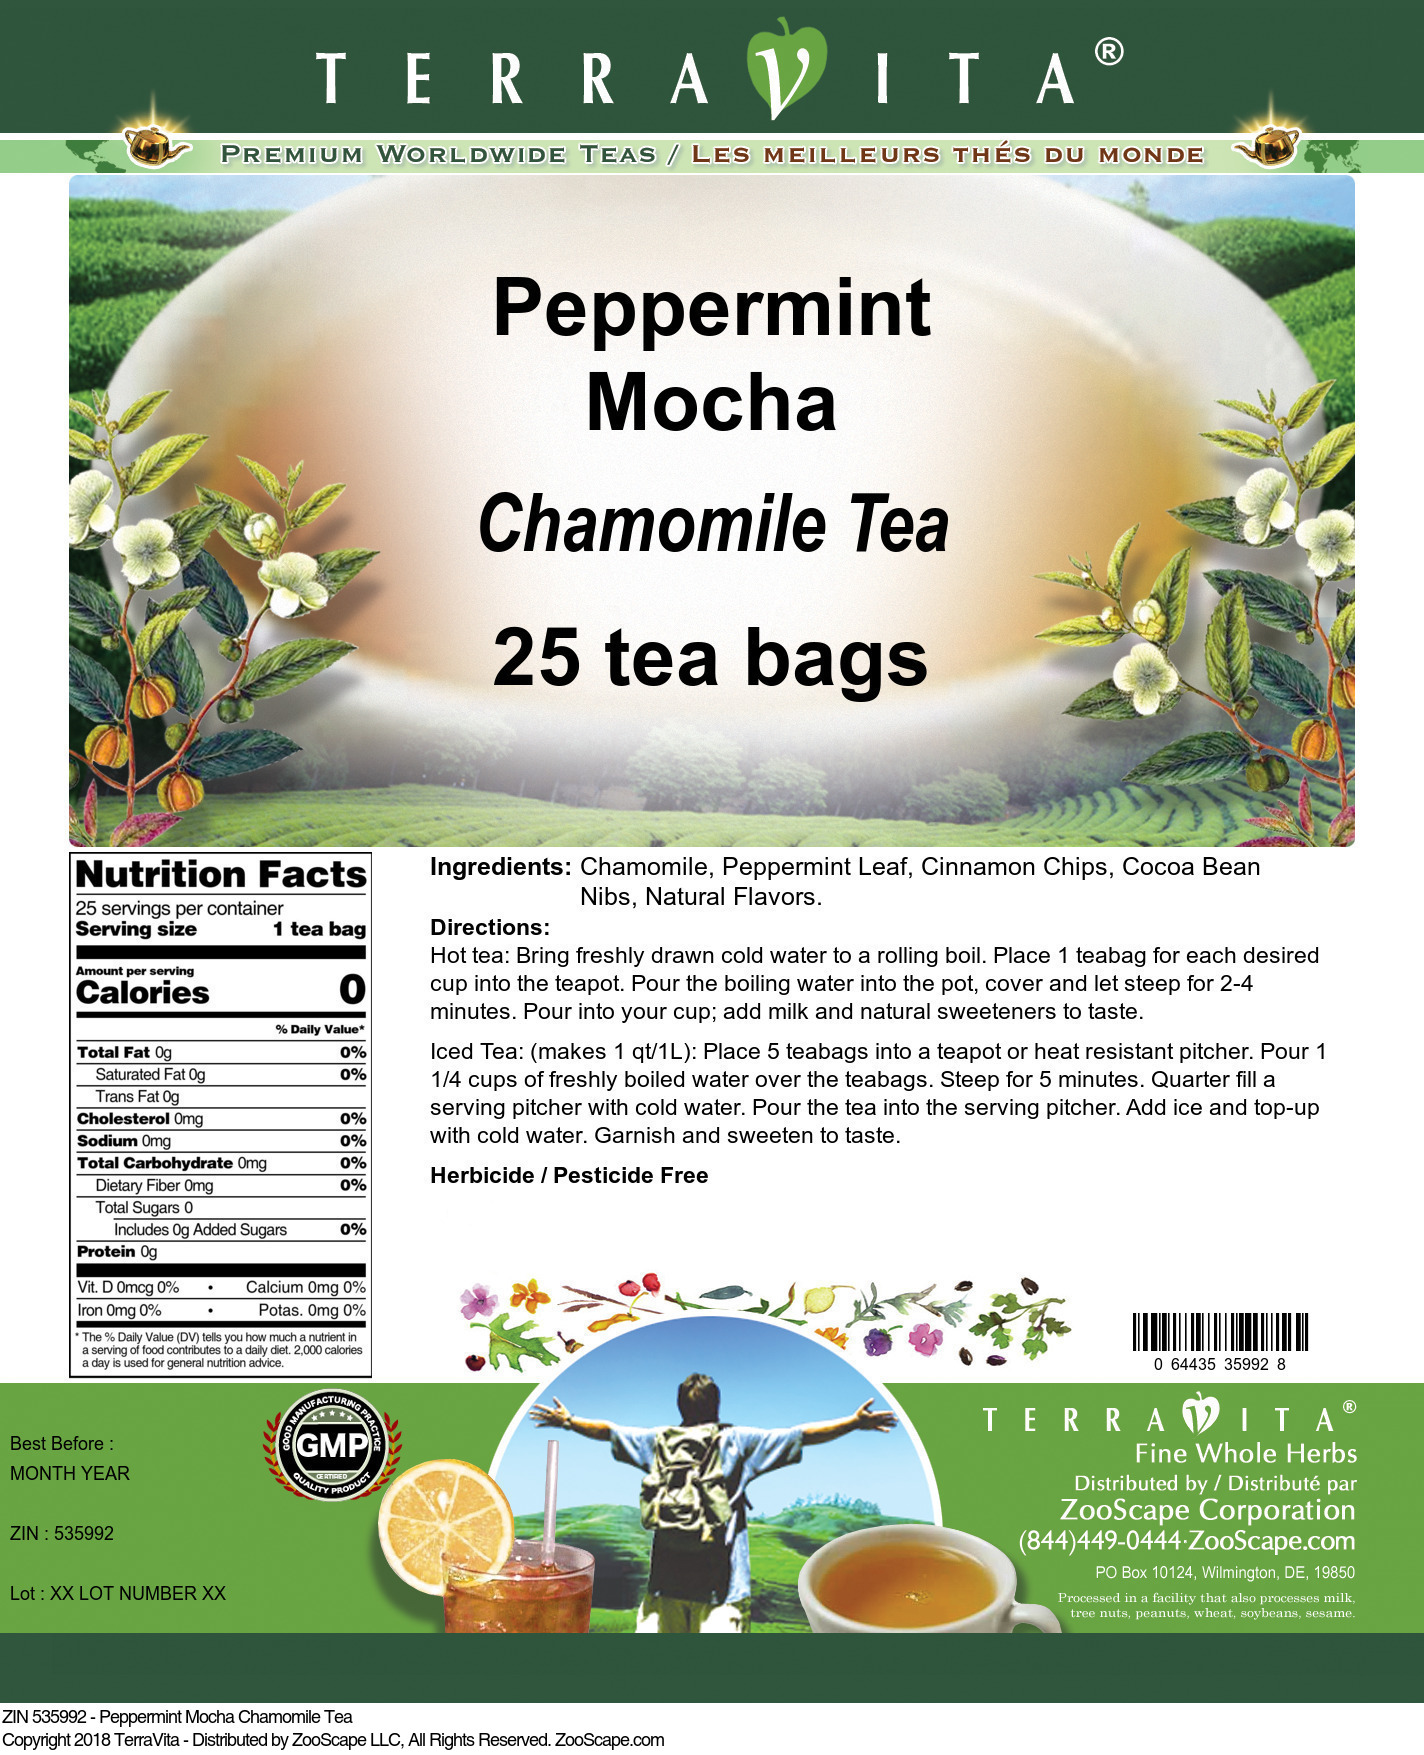 Peppermint Mocha Chamomile Tea